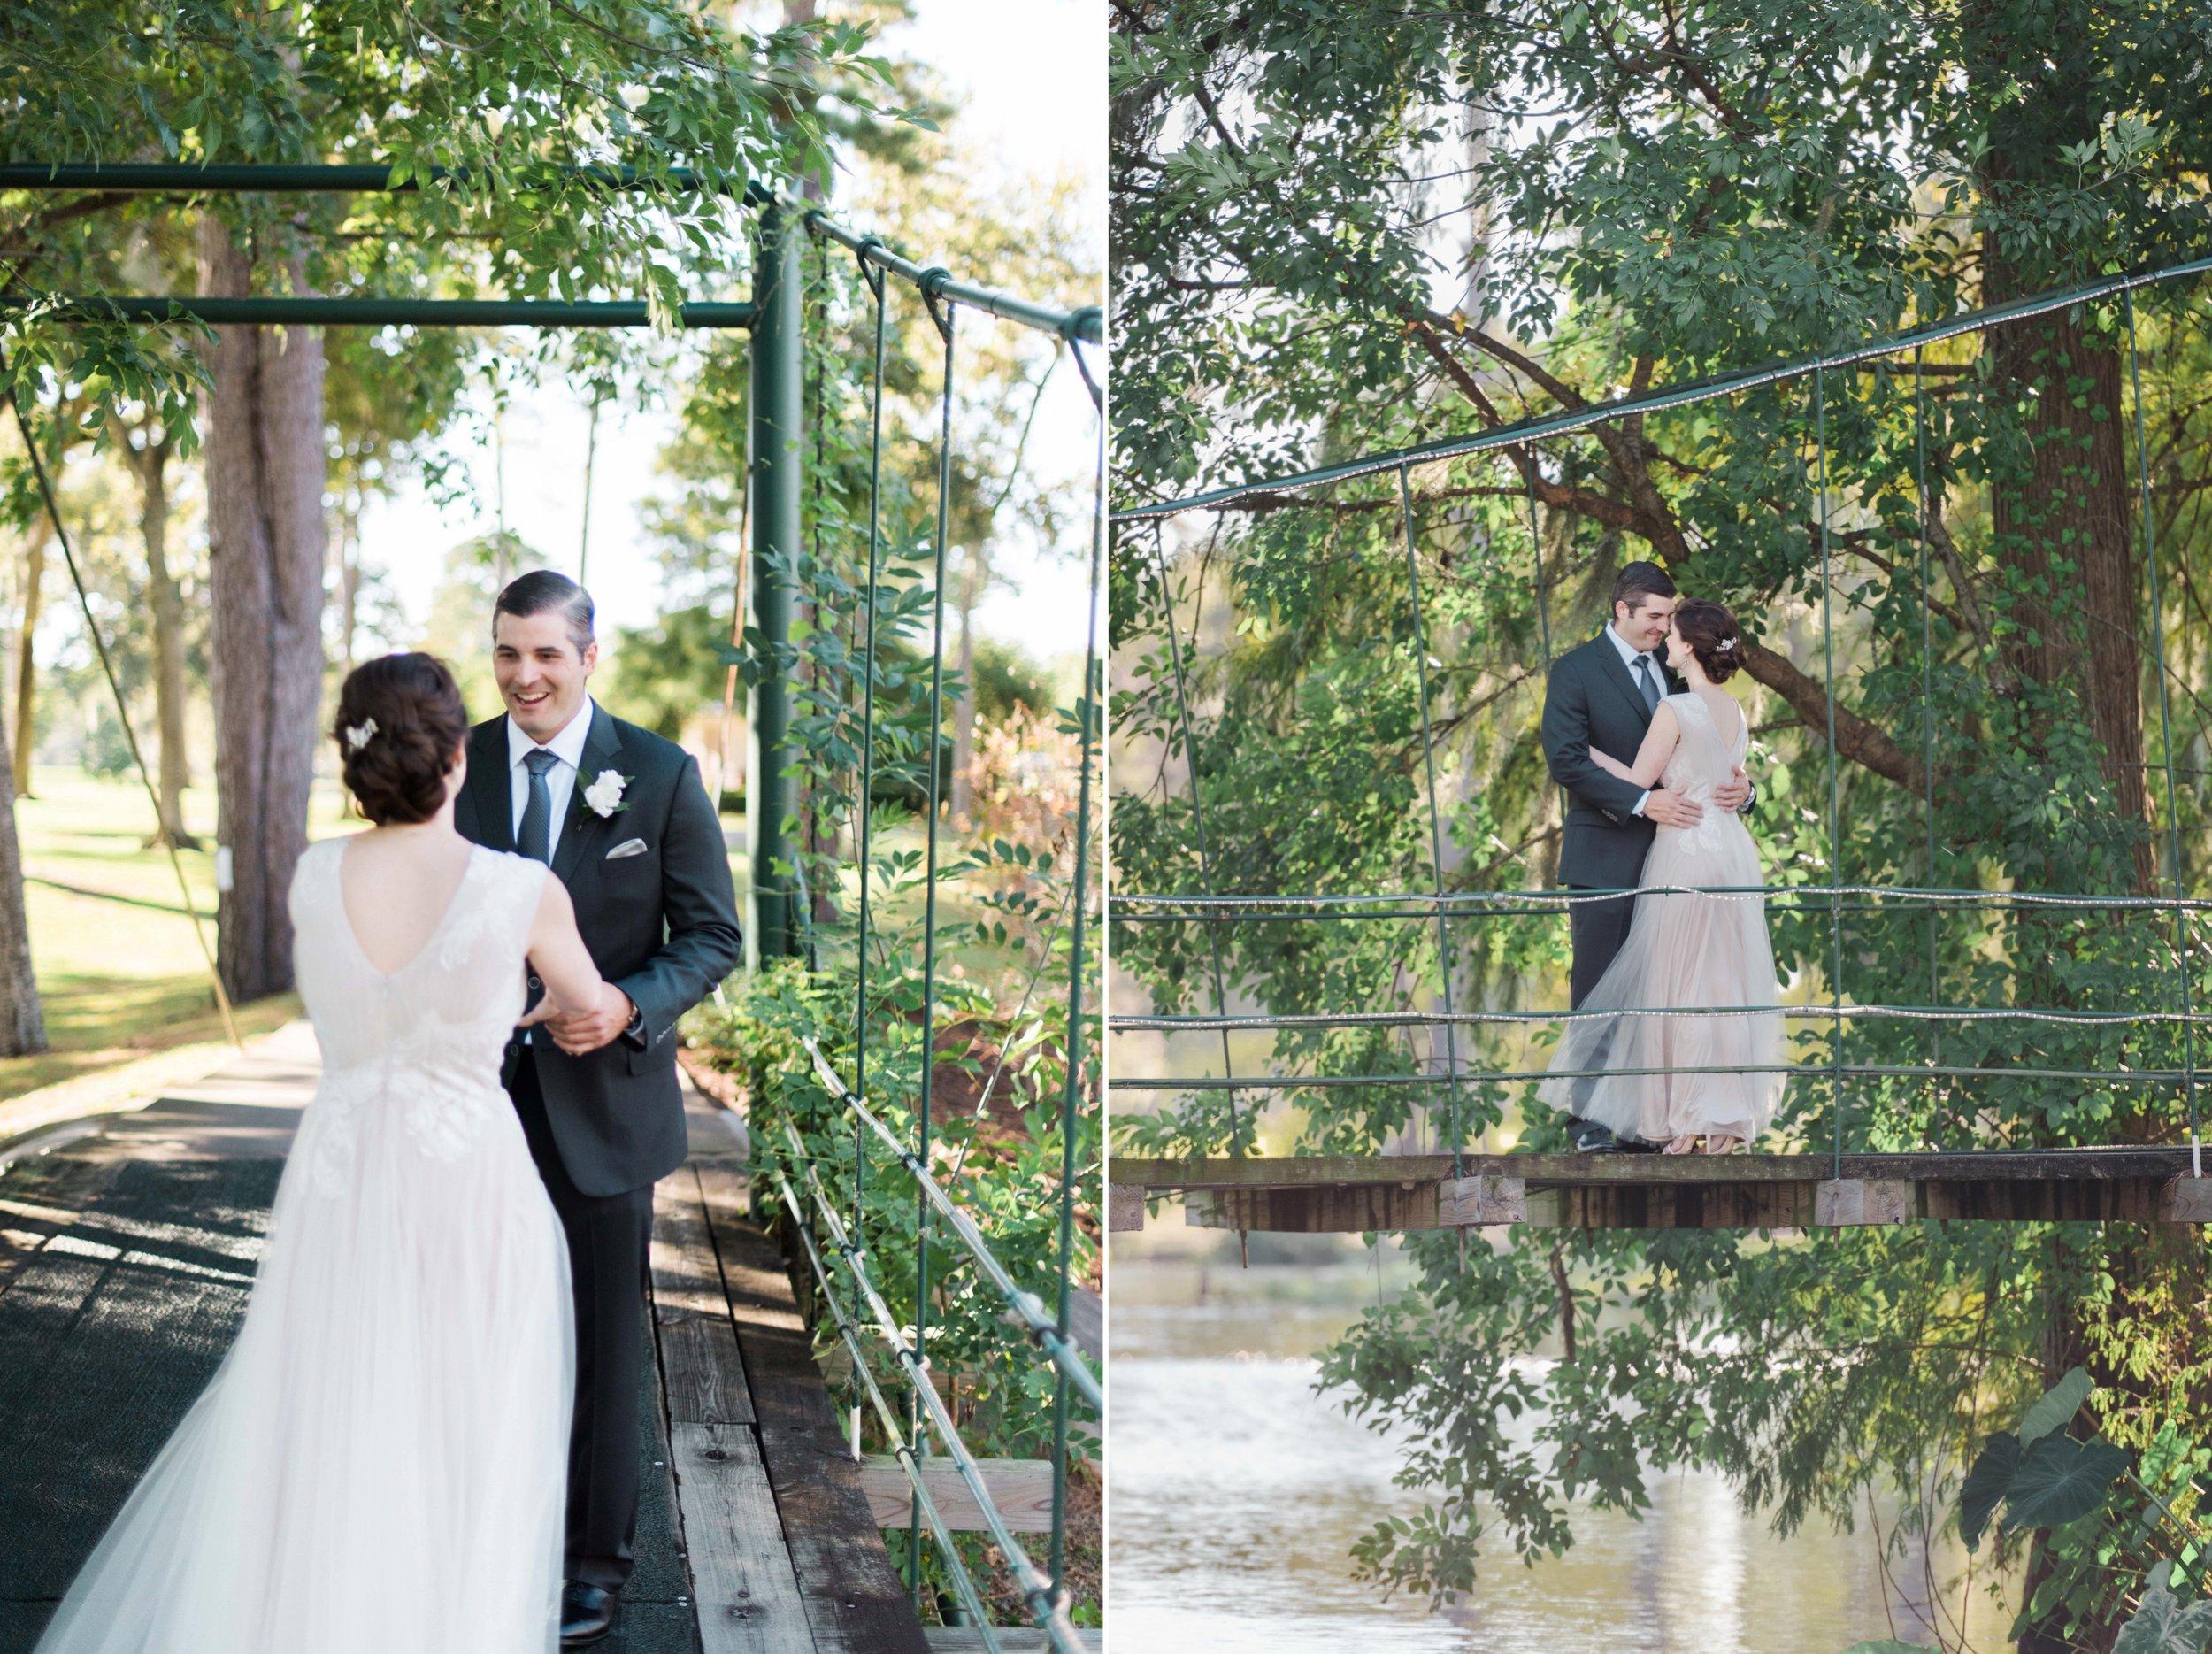 Houston-Wedding-Photographer-Lakeside-Country-Club-First-Look-Bride-Groom-Formals-Film-Fine-Art-Photography-4938.jpg